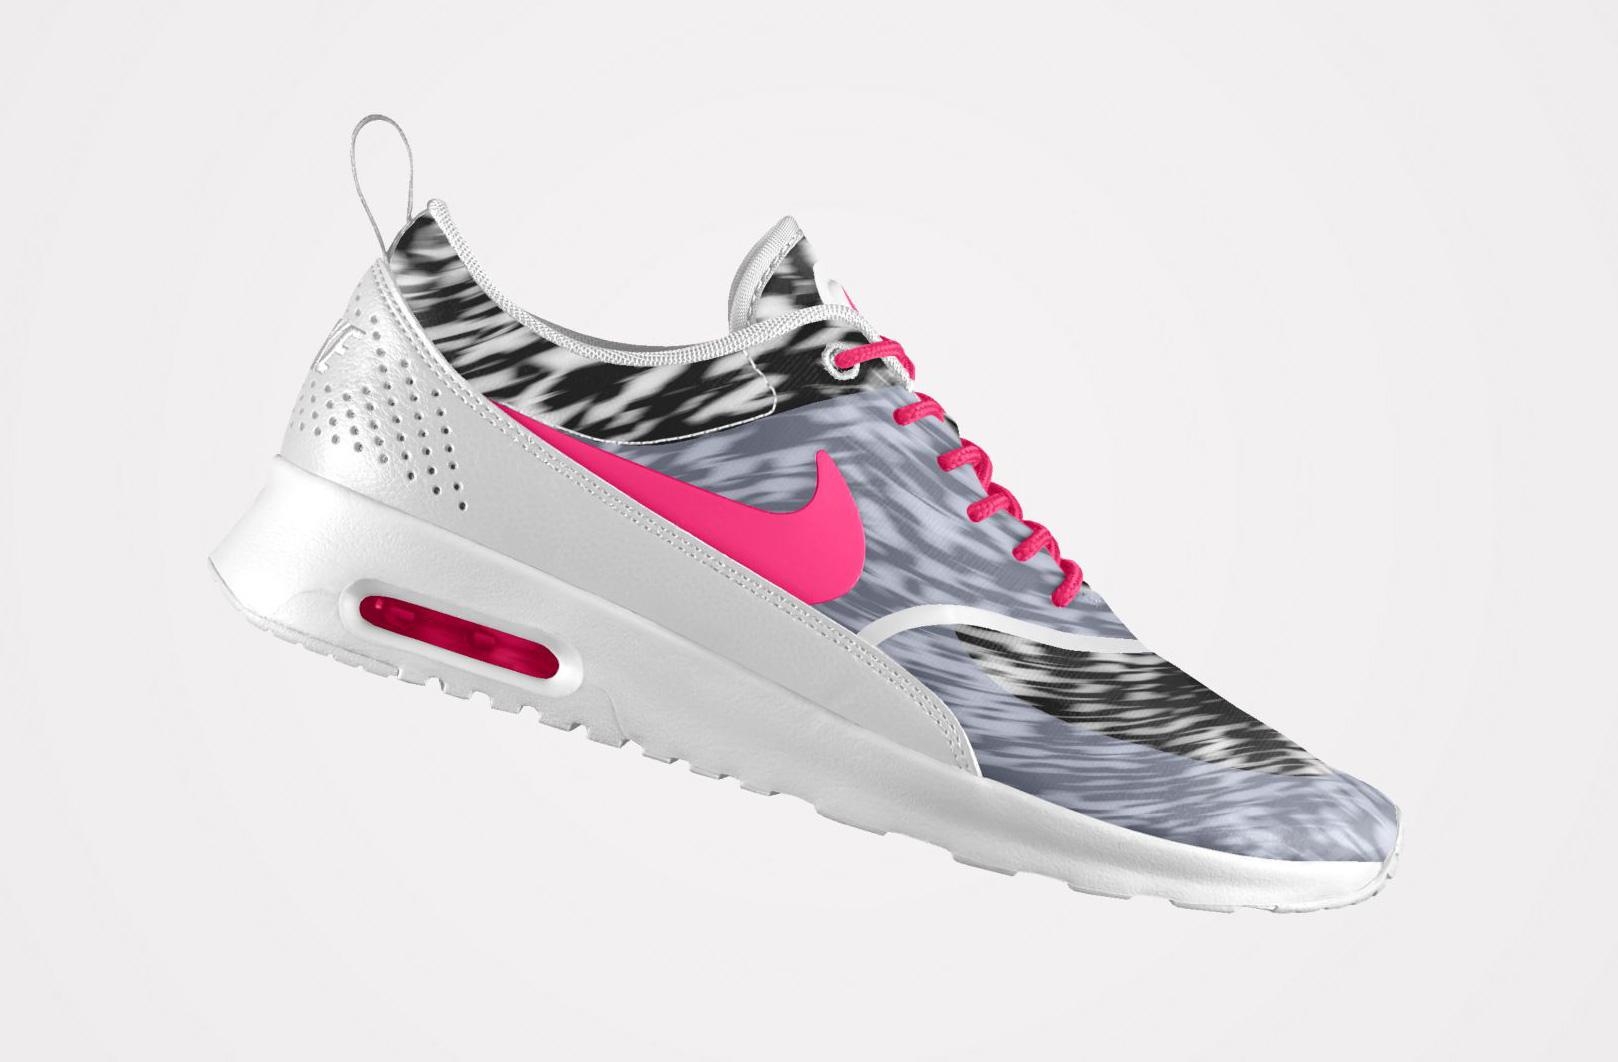 Nike Air Max 2014 iD Design Selv! Cool Sneakers